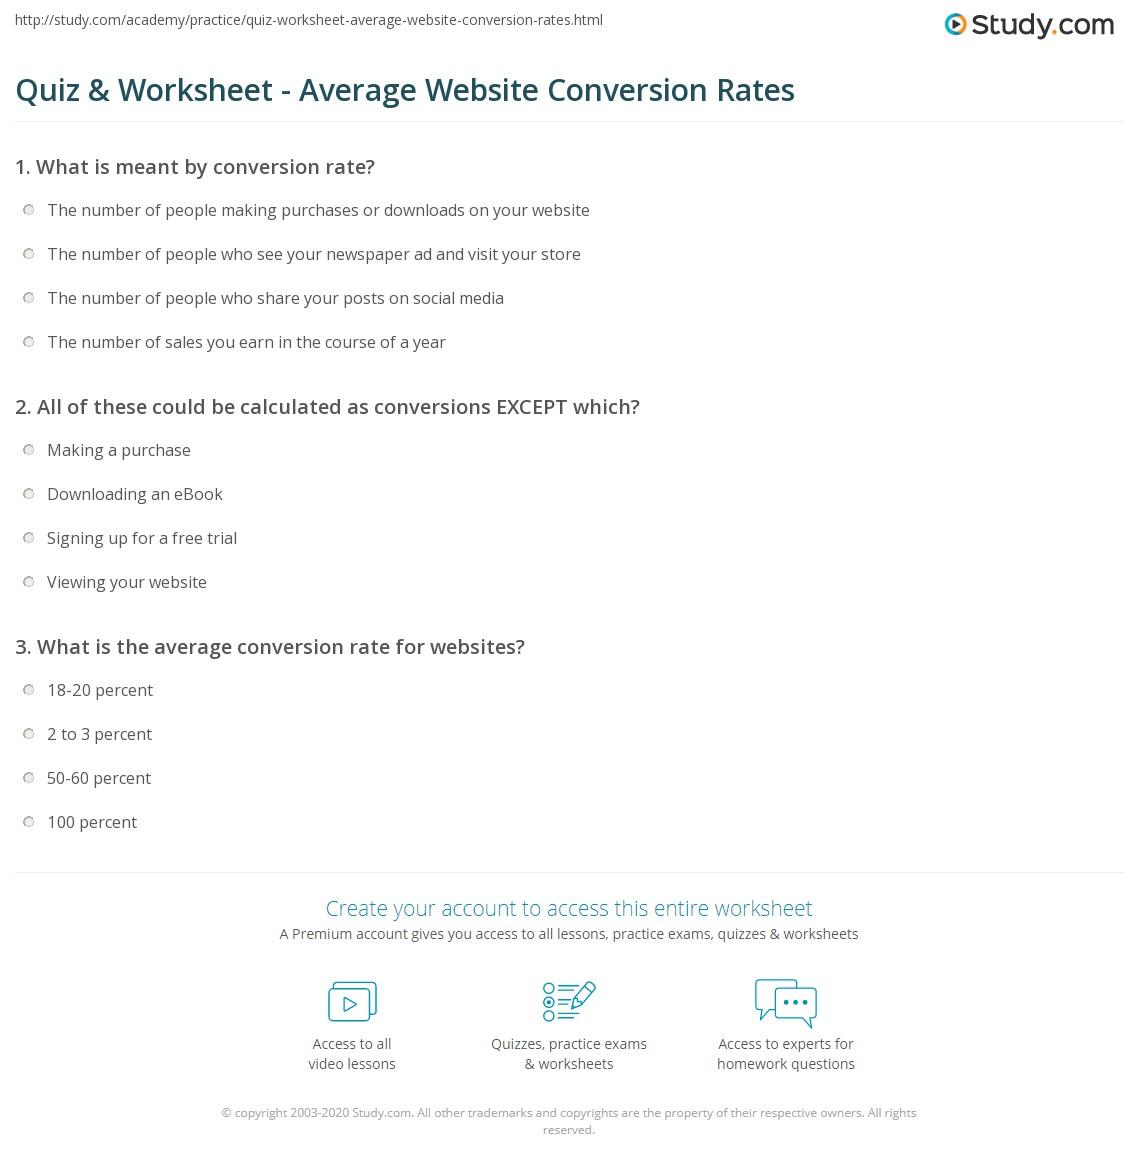 Quiz & Worksheet - Average Website Conversion Rates | Study.com